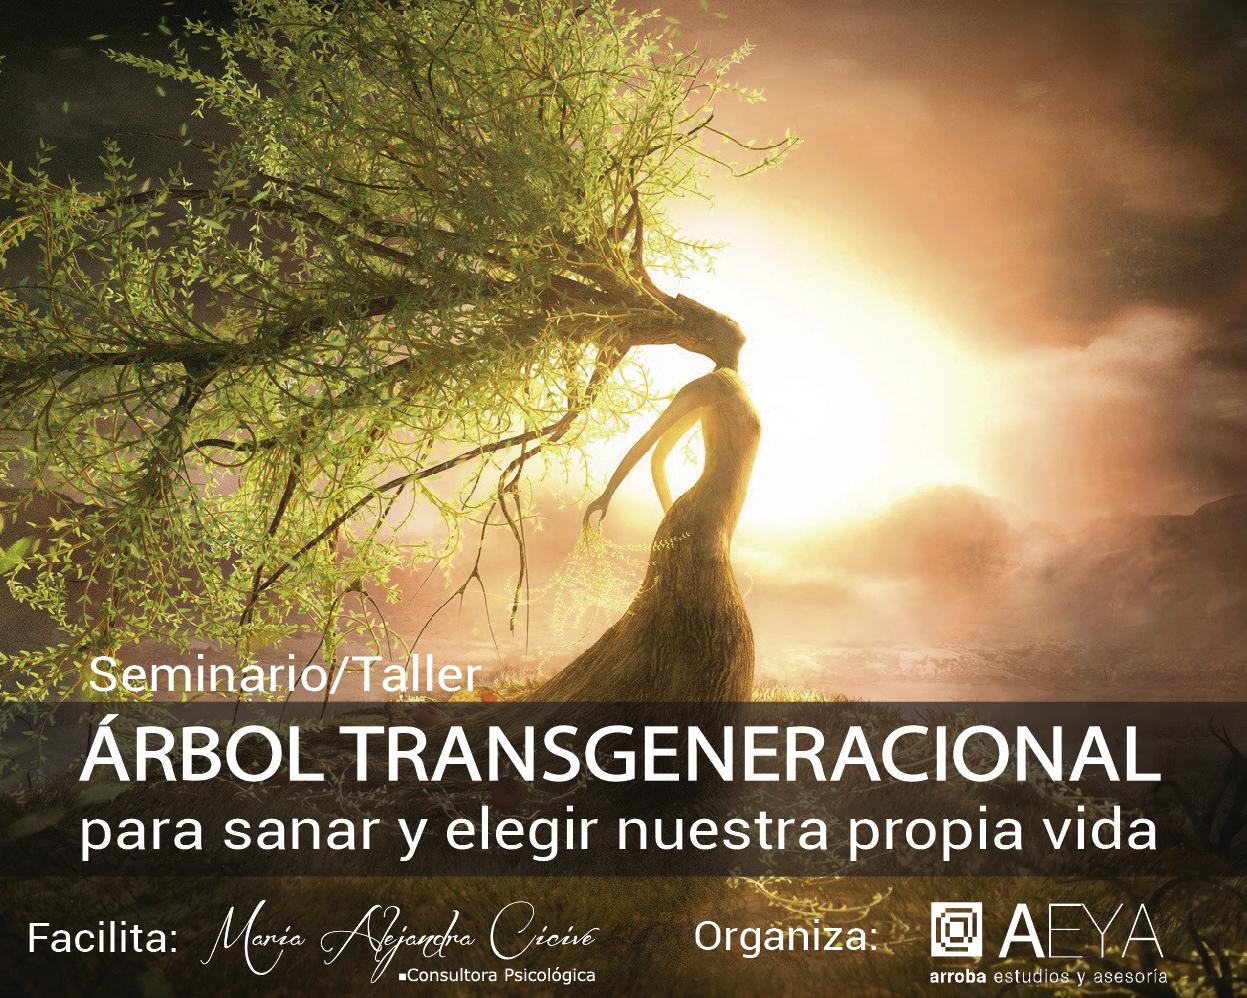 SEMINARIO/TALLER - ÁRBOL TRANSGENERACIONAL